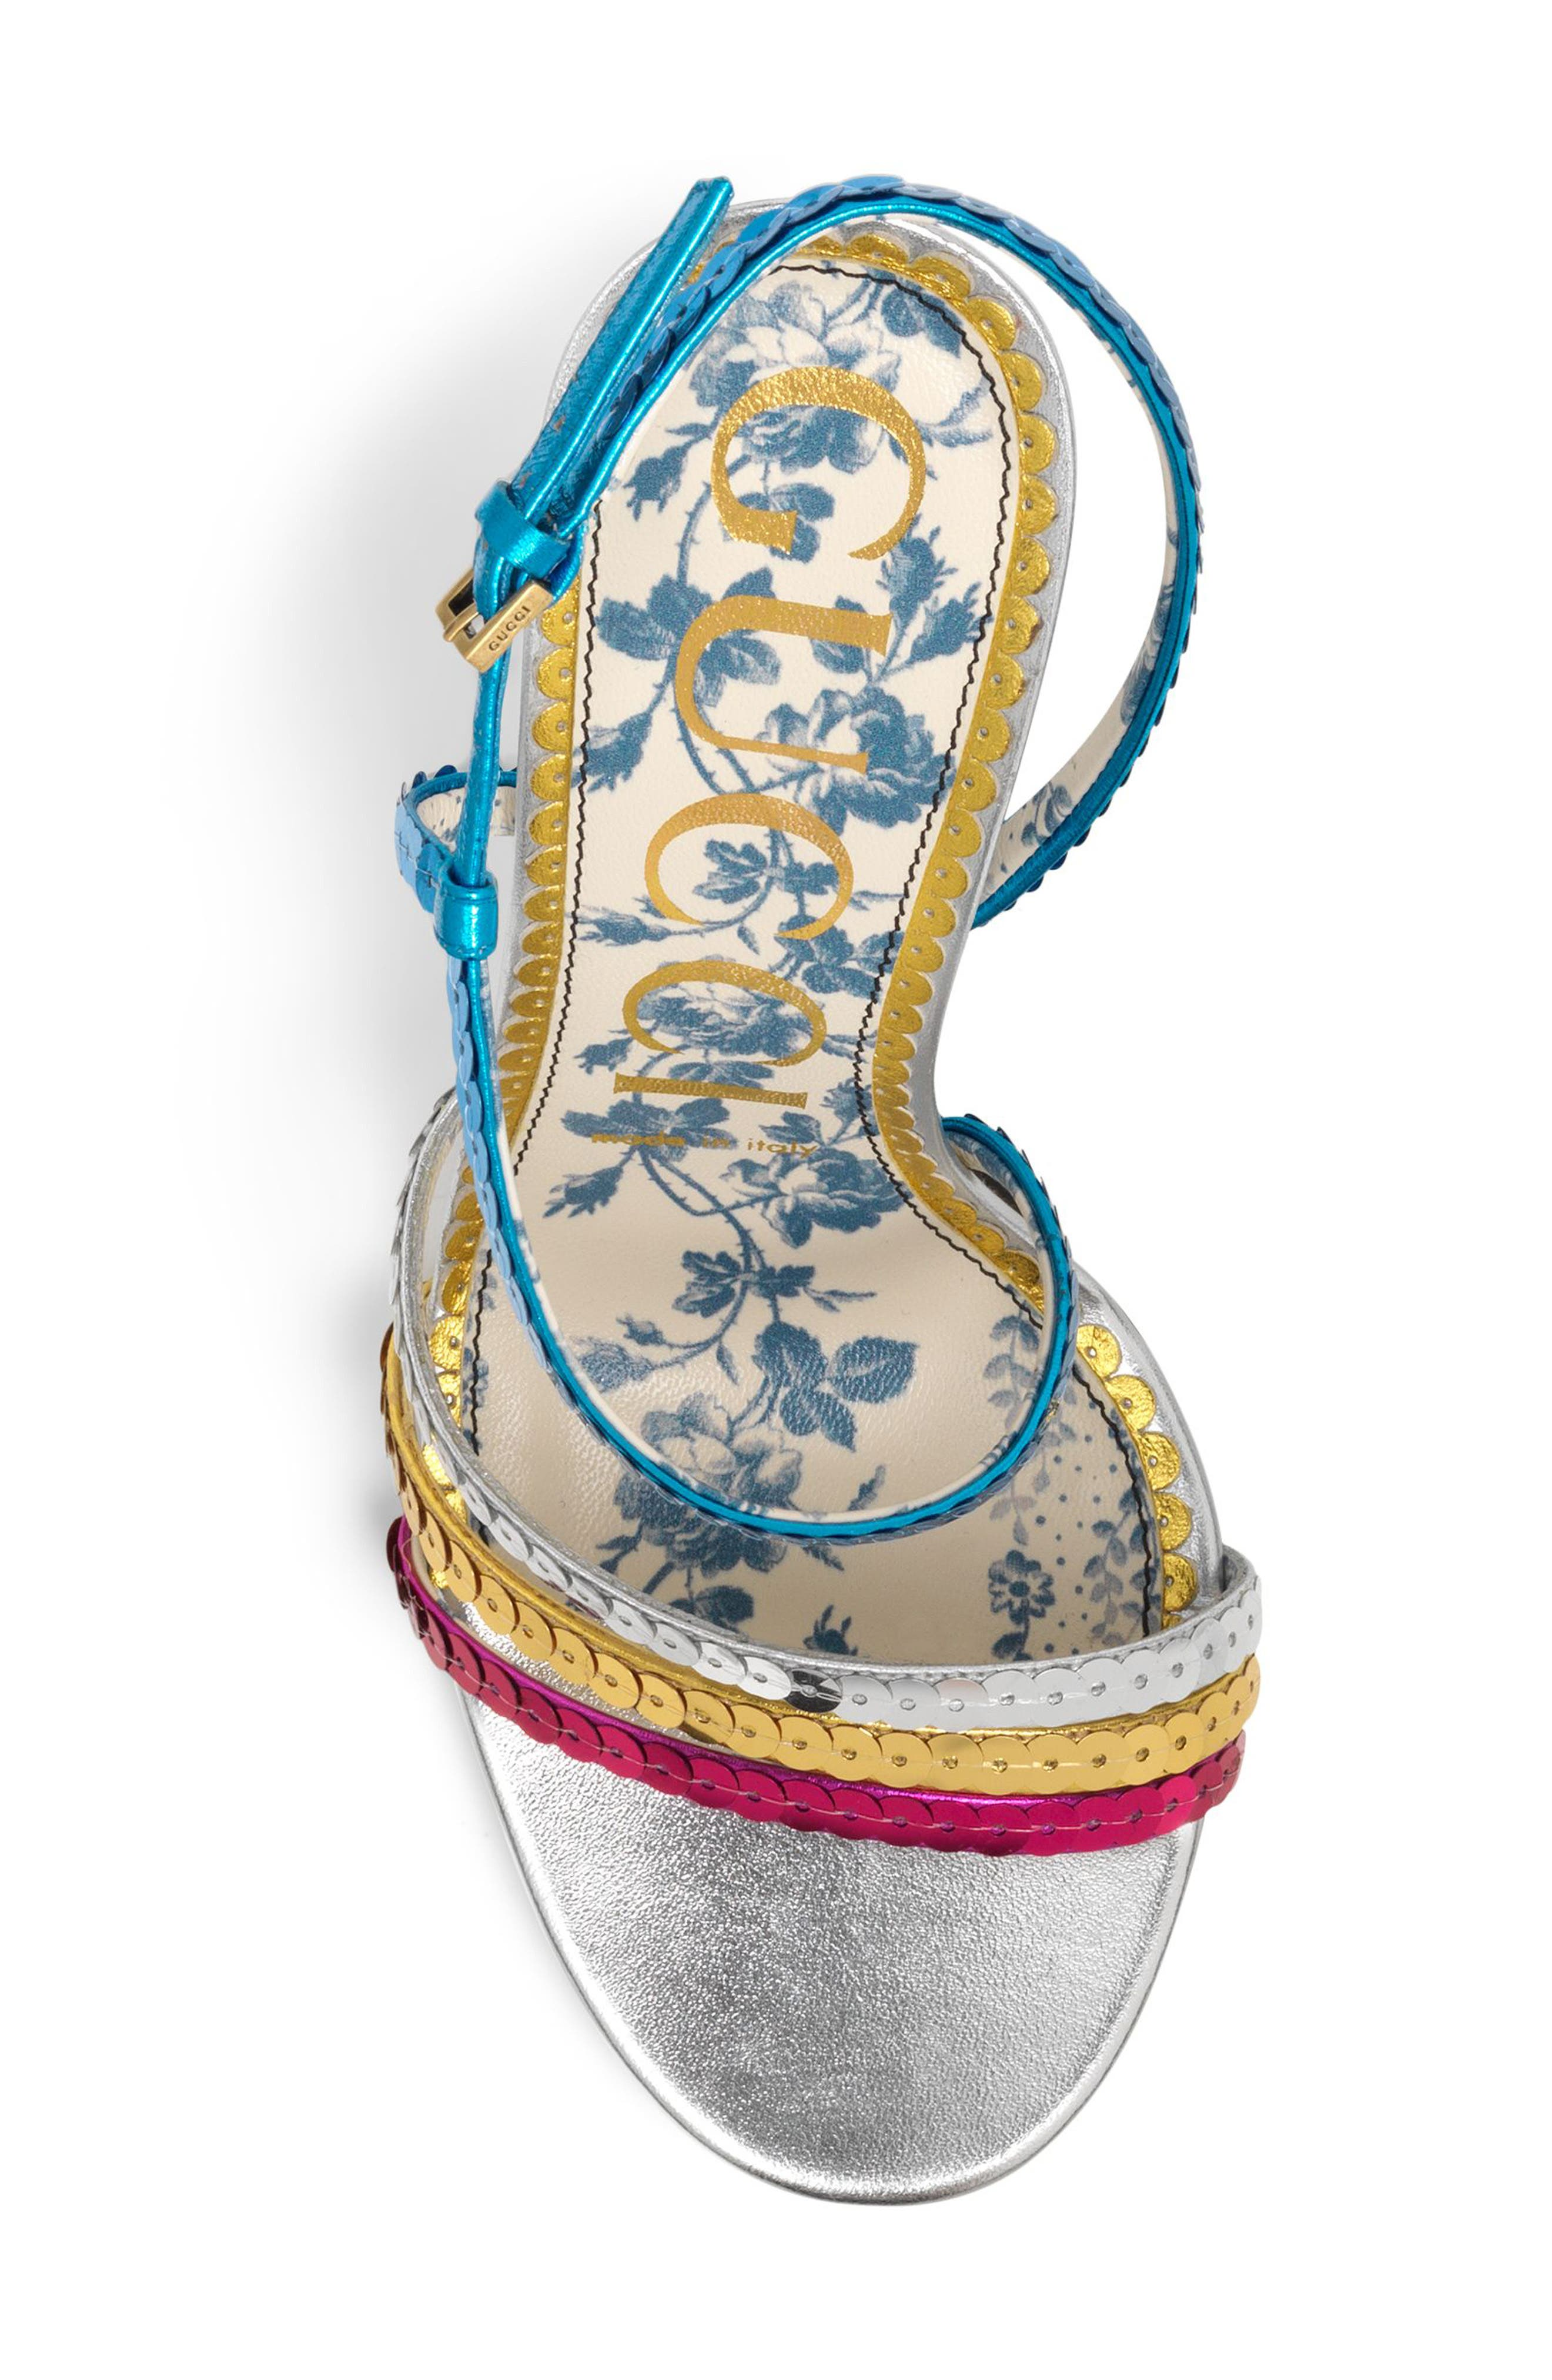 Sequin Sandal,                             Alternate thumbnail 4, color,                             Silver/ Blue/ Pink